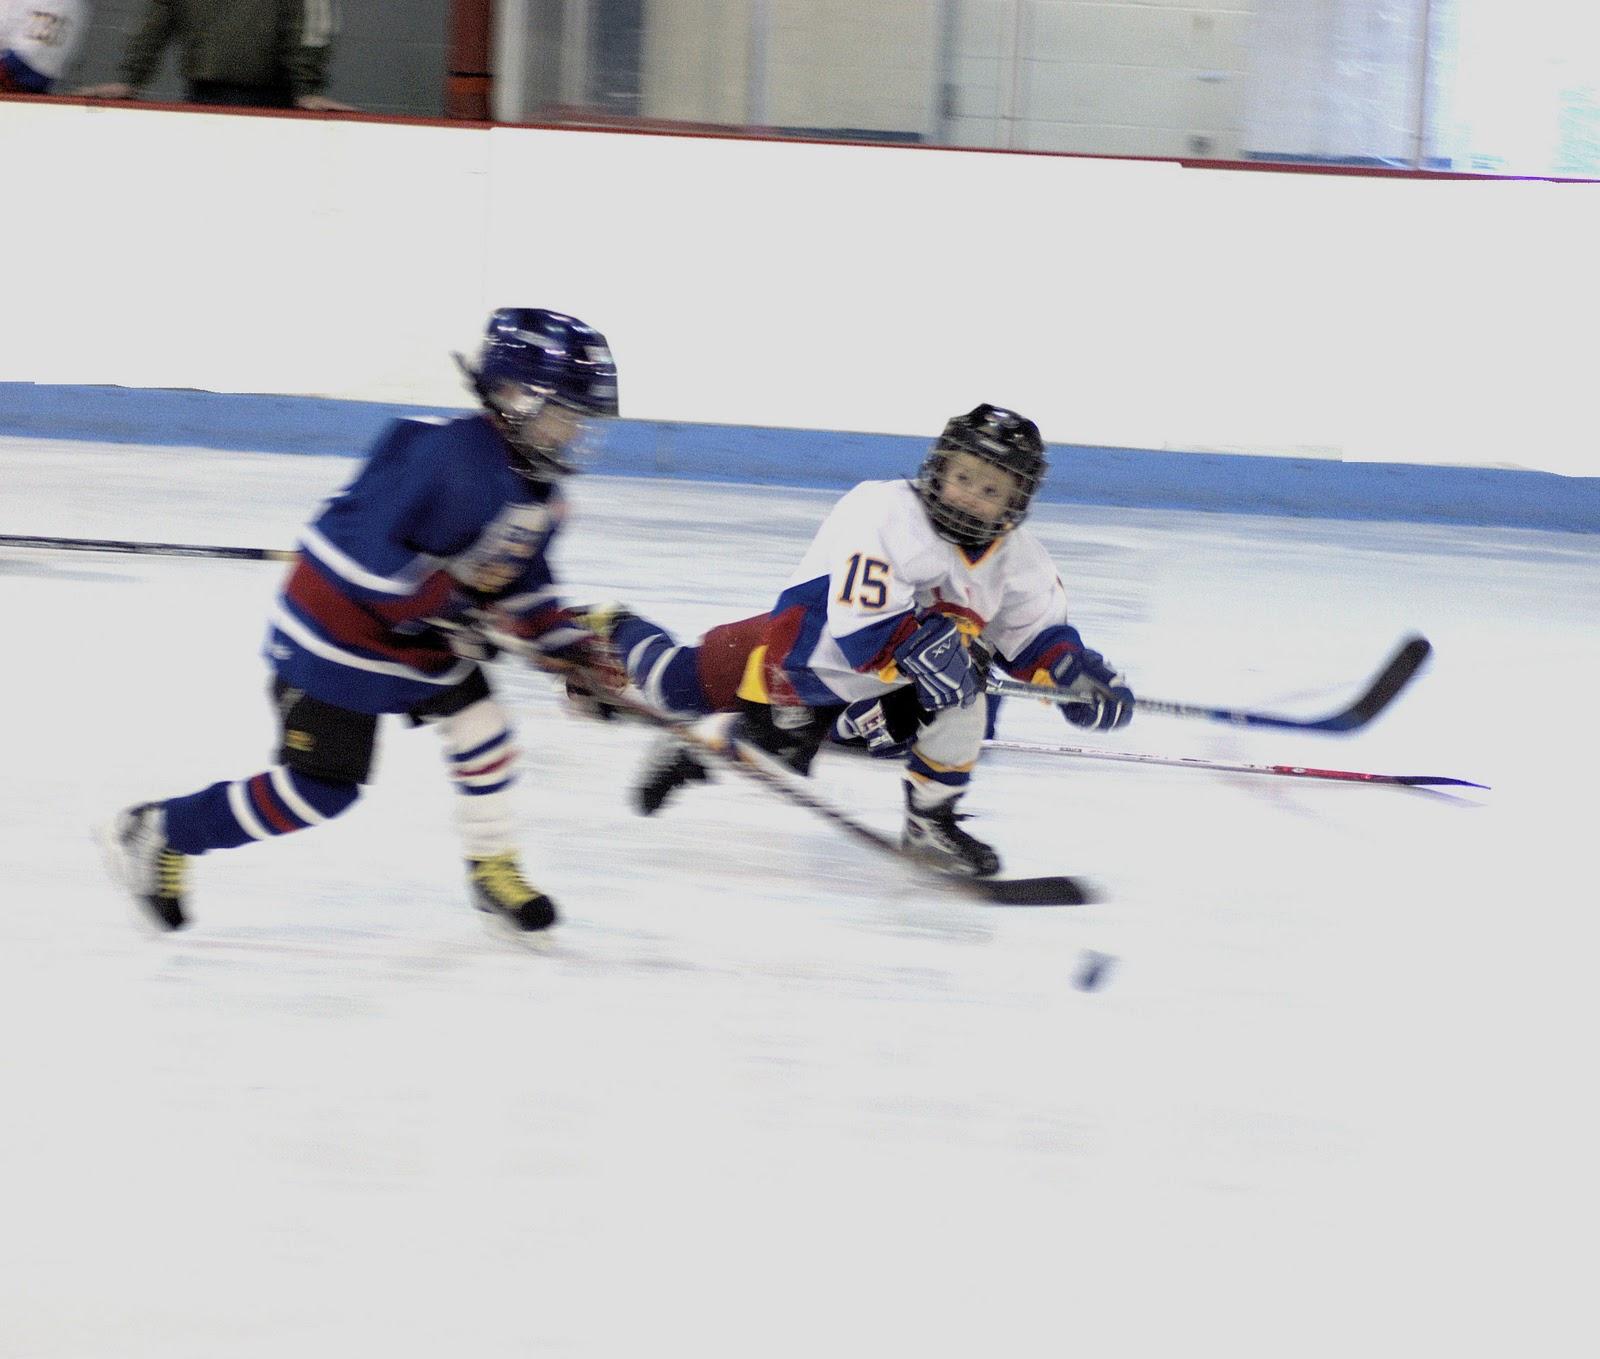 USA vs Russia ice hockey |betfair sports rules Hockey betfair casino - online casino australia